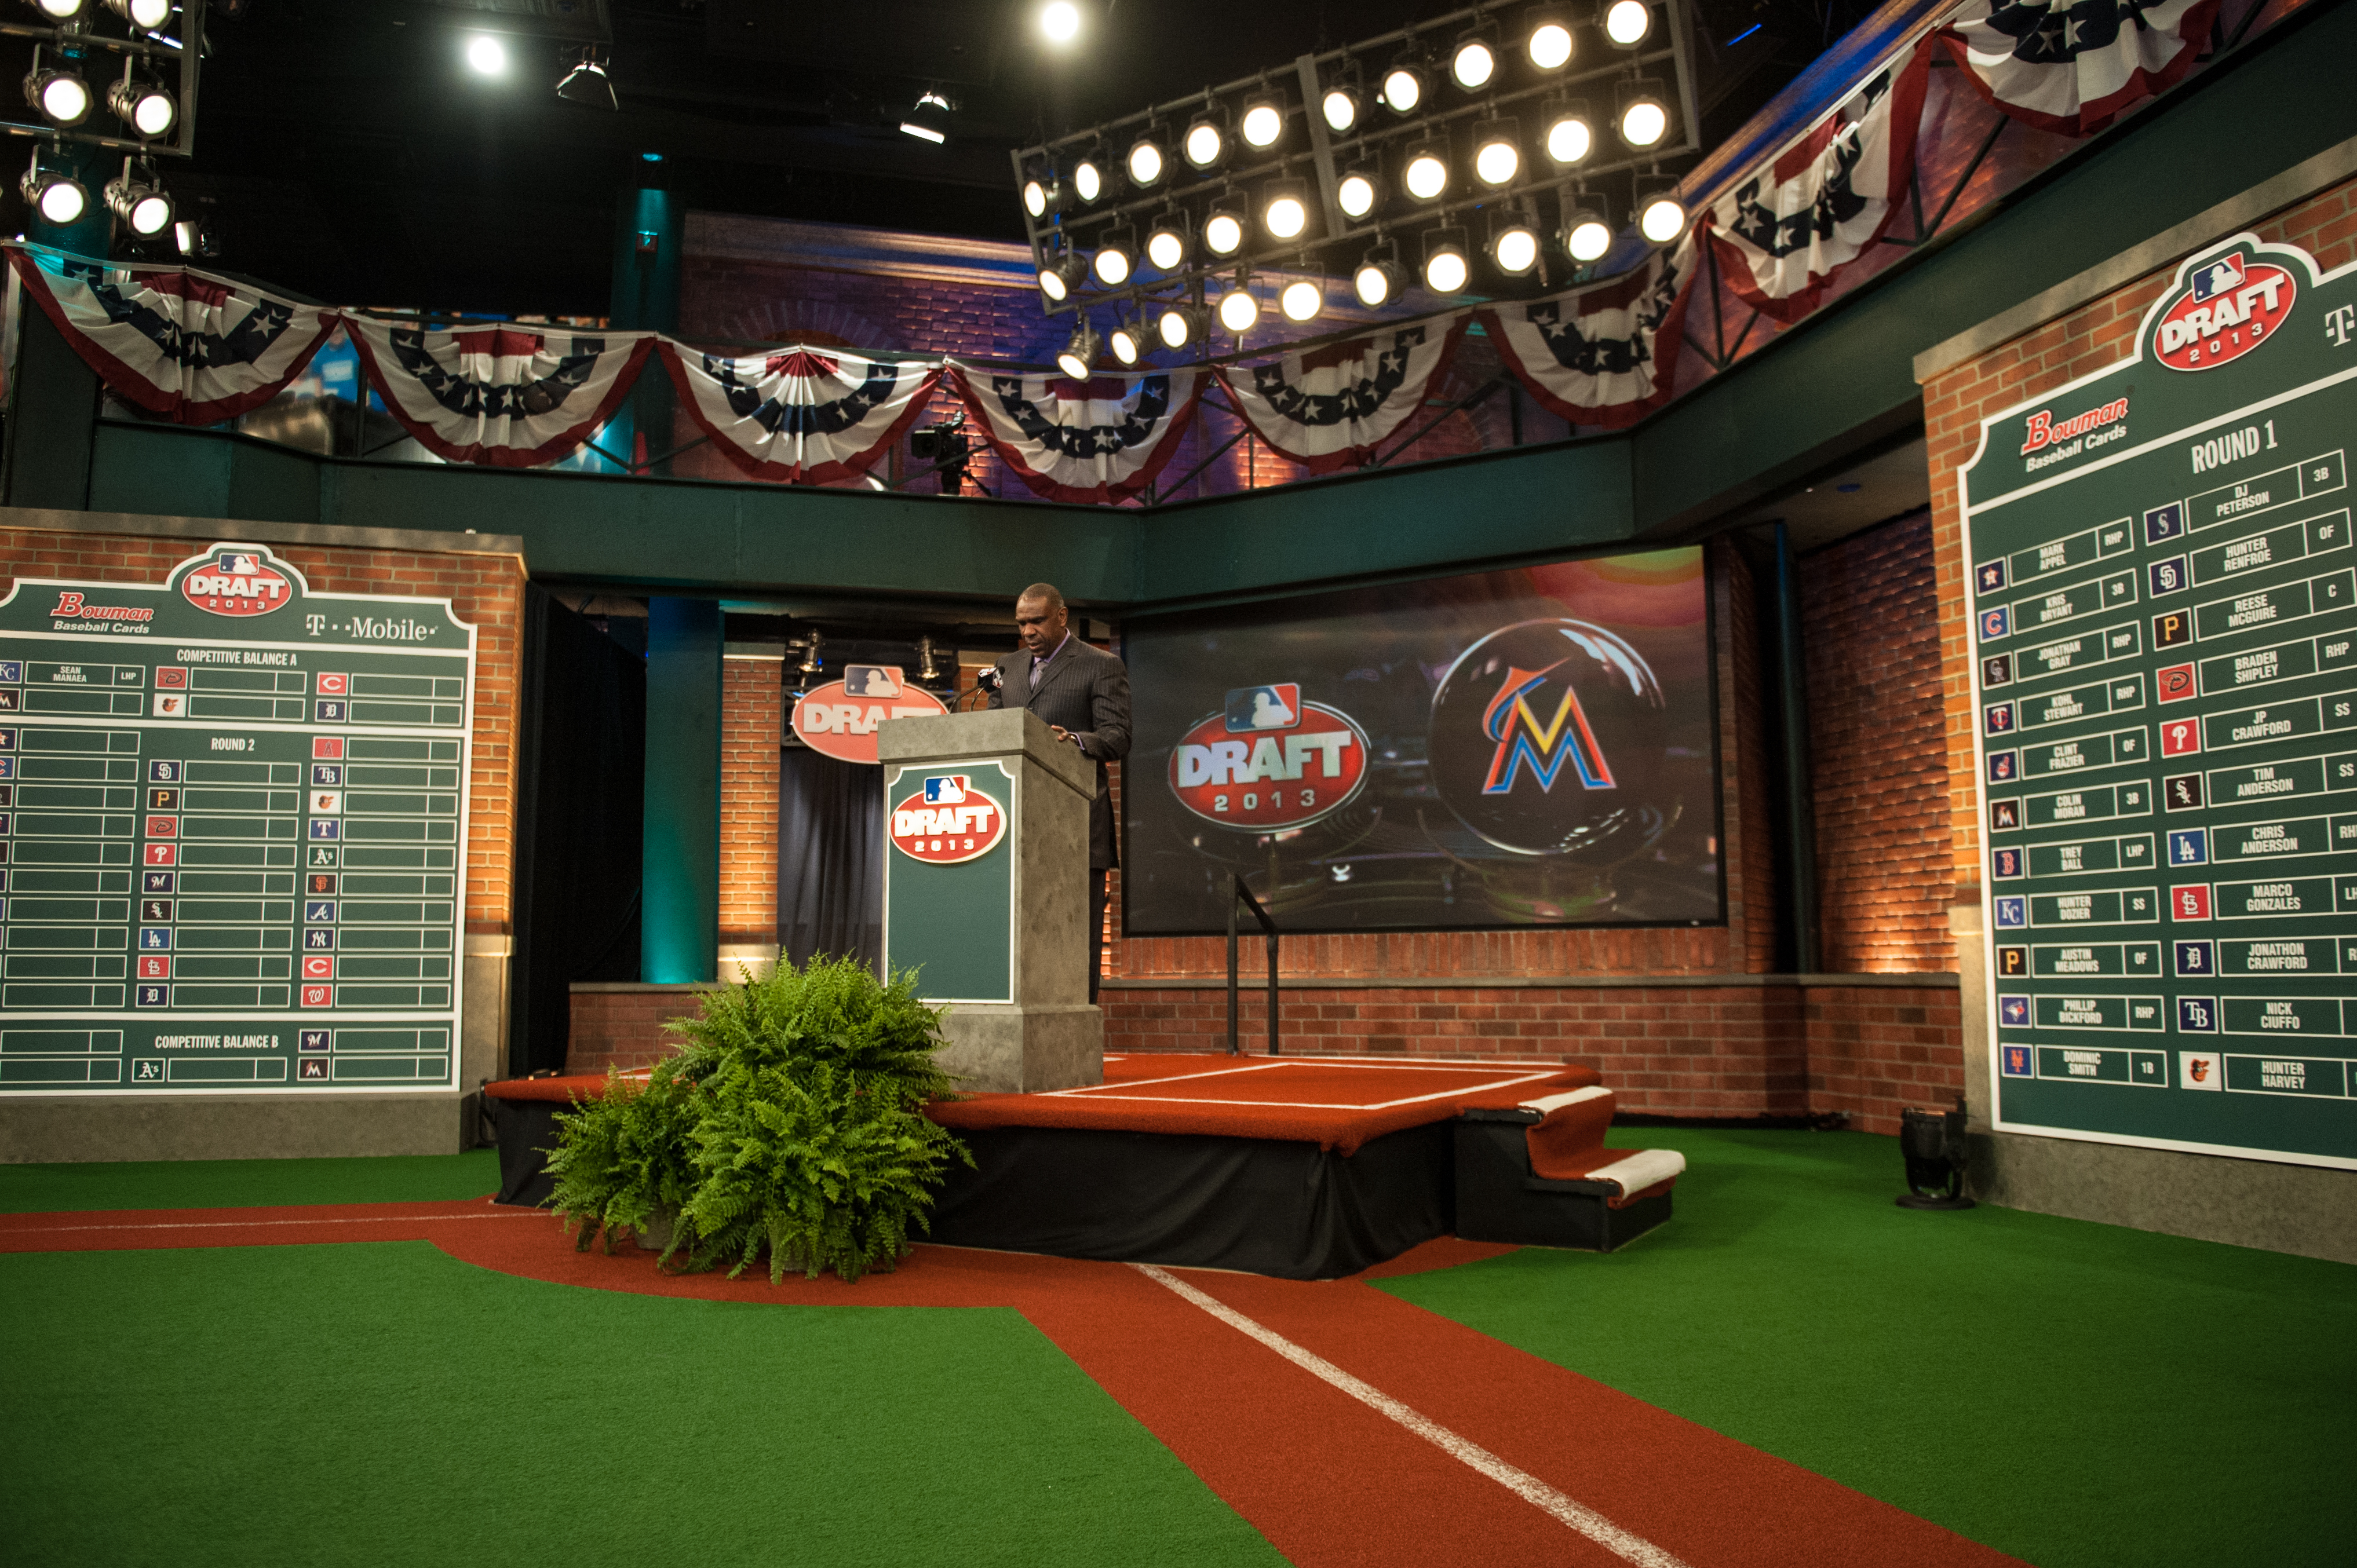 2013 mlb draft board (MLB Photos via Getty)